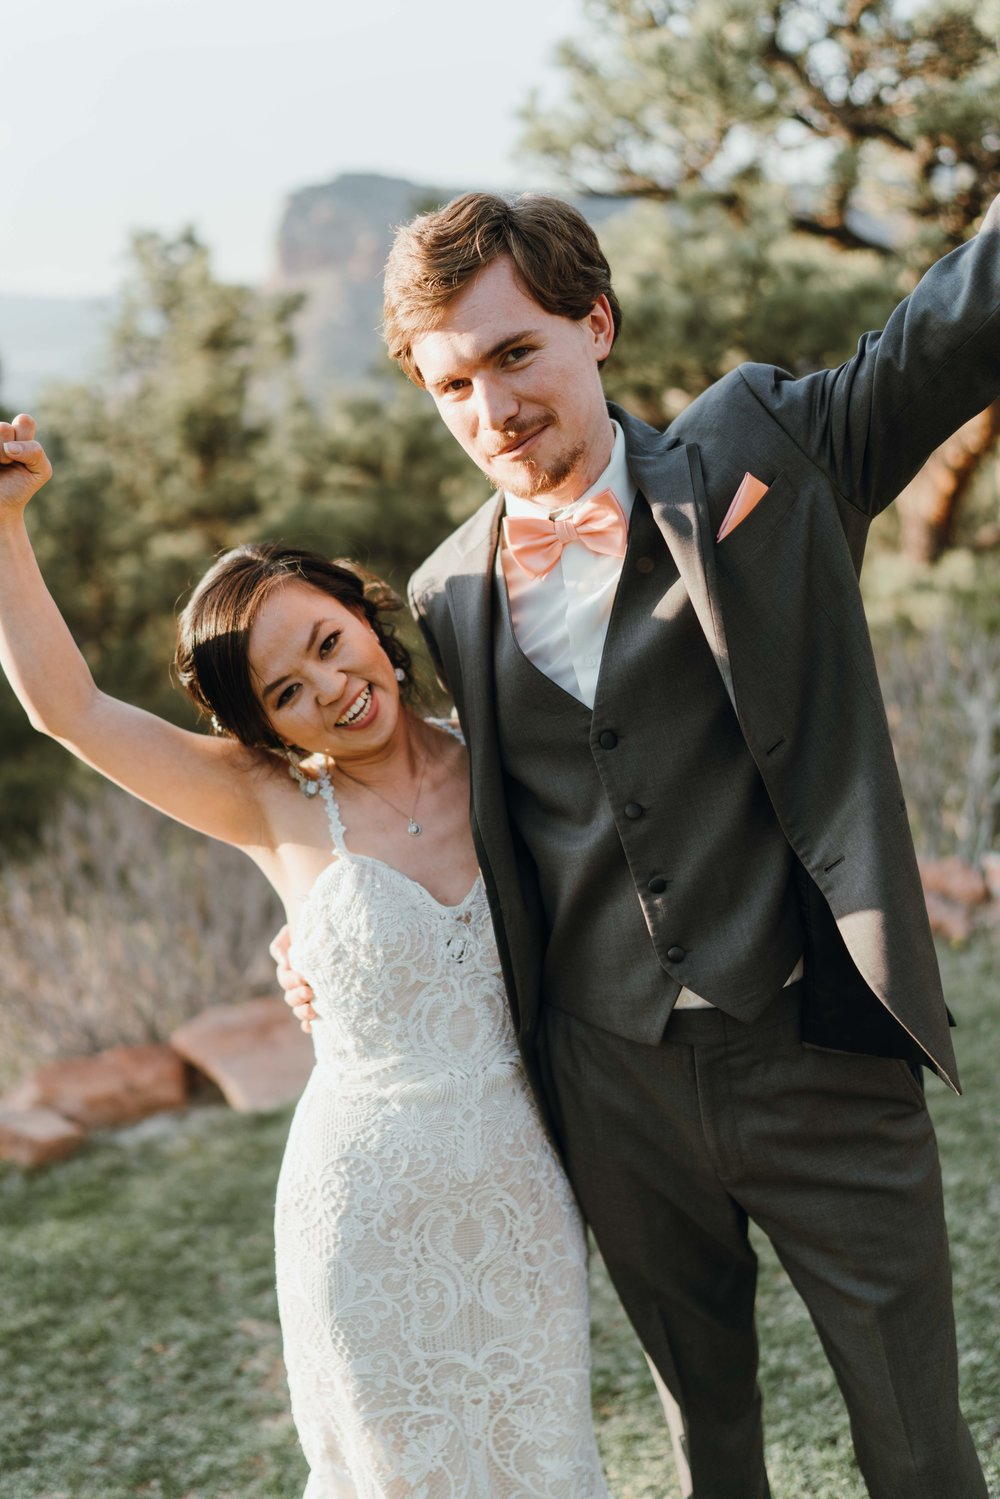 denver wedding photographer lioncrest manor in lyons ben and mali -DSC06471.jpg